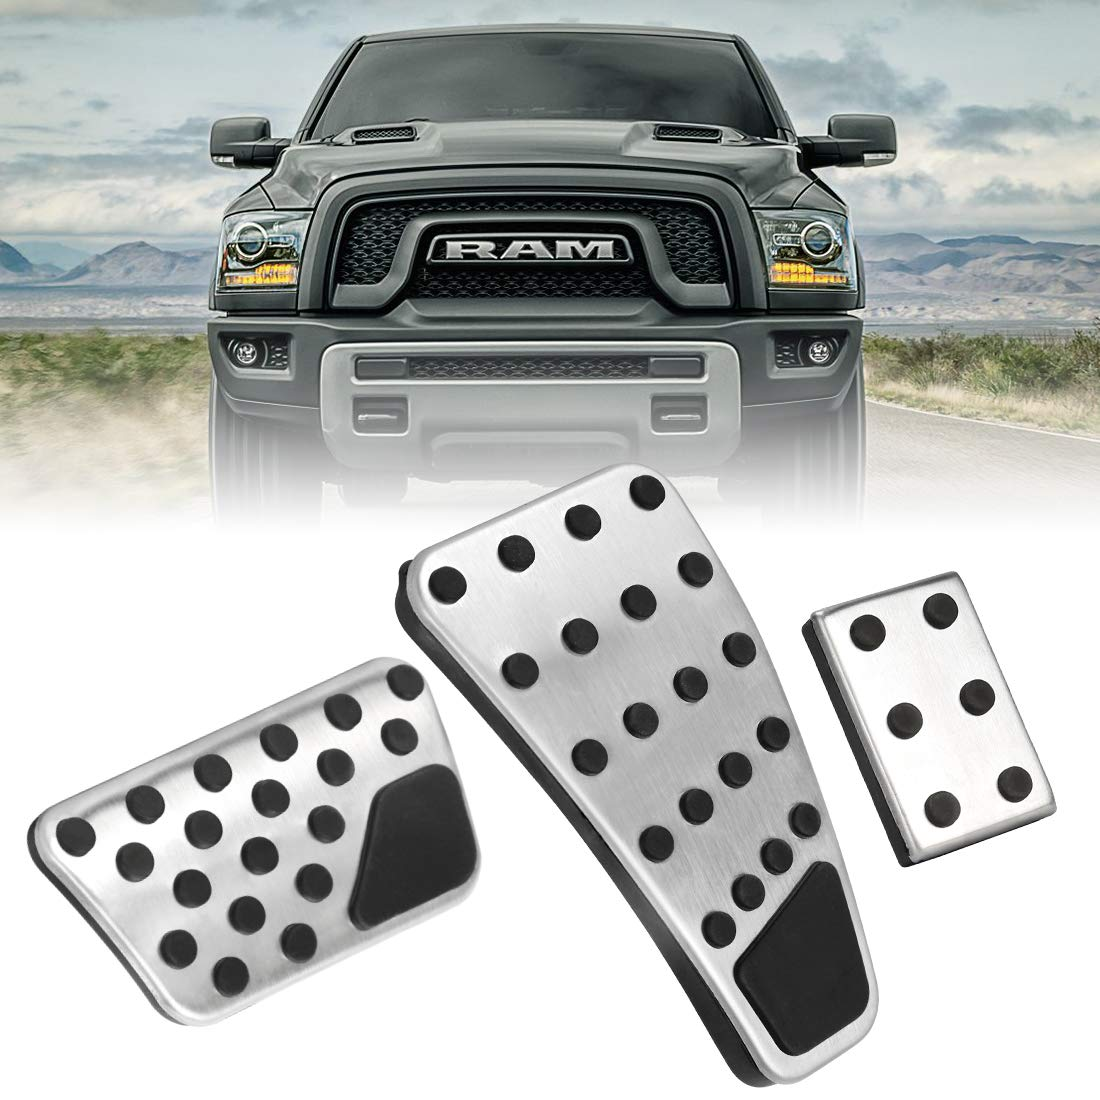 BORDAN Dodge Ram Accelerator Gas Pedal Brake Pedal Cover Aluminum Alloy Foot Pedal Pads Kit Fit for Dodge Ram 2011-2018 1500 2500 3500